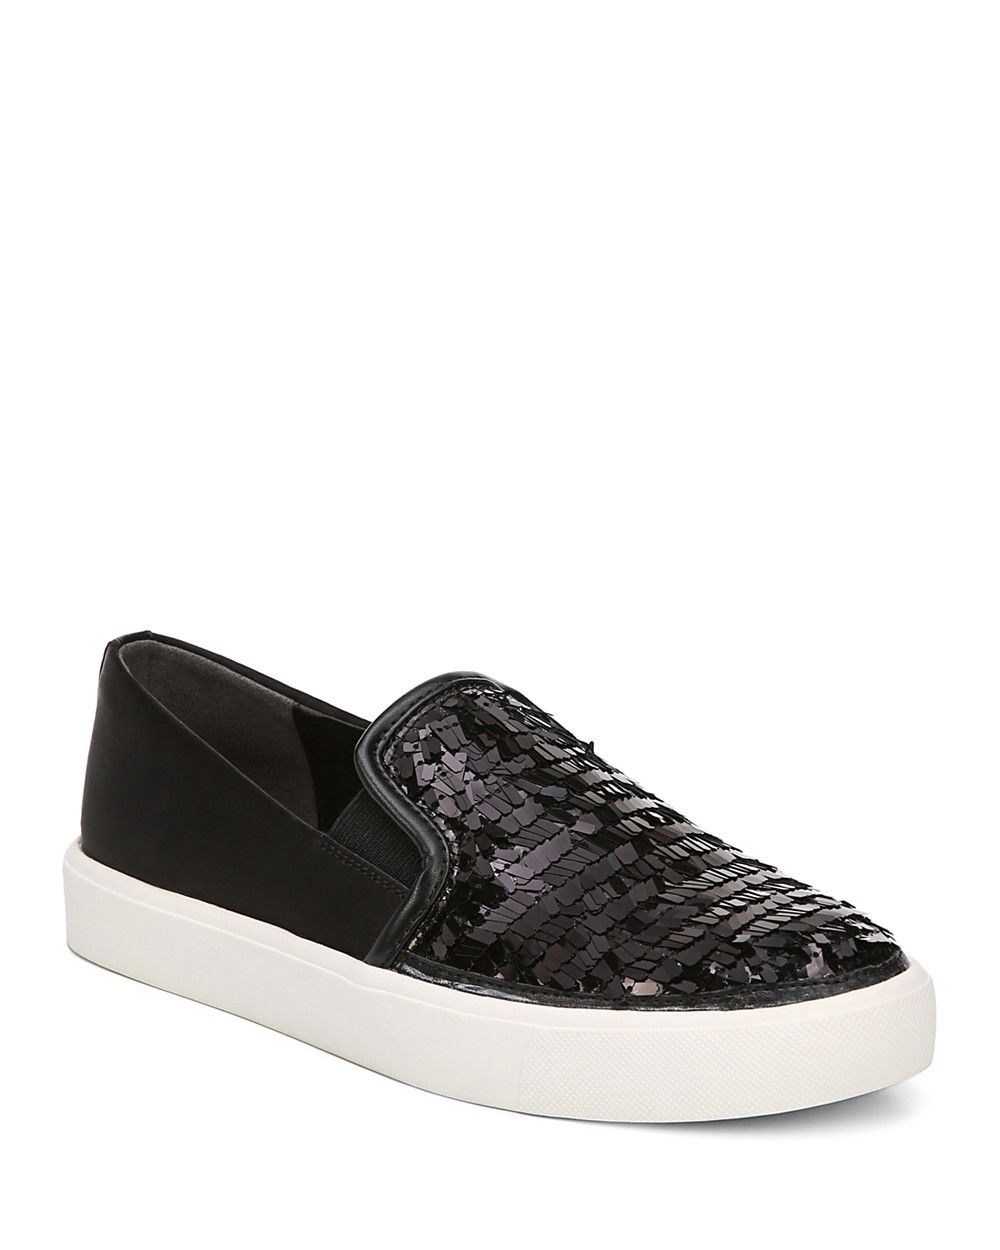 dfd058c51c30 SAM EDELMAN Sam Edelman Women s Elton Sequined Satin Slip-On Sneakers.   samedelman  shoes